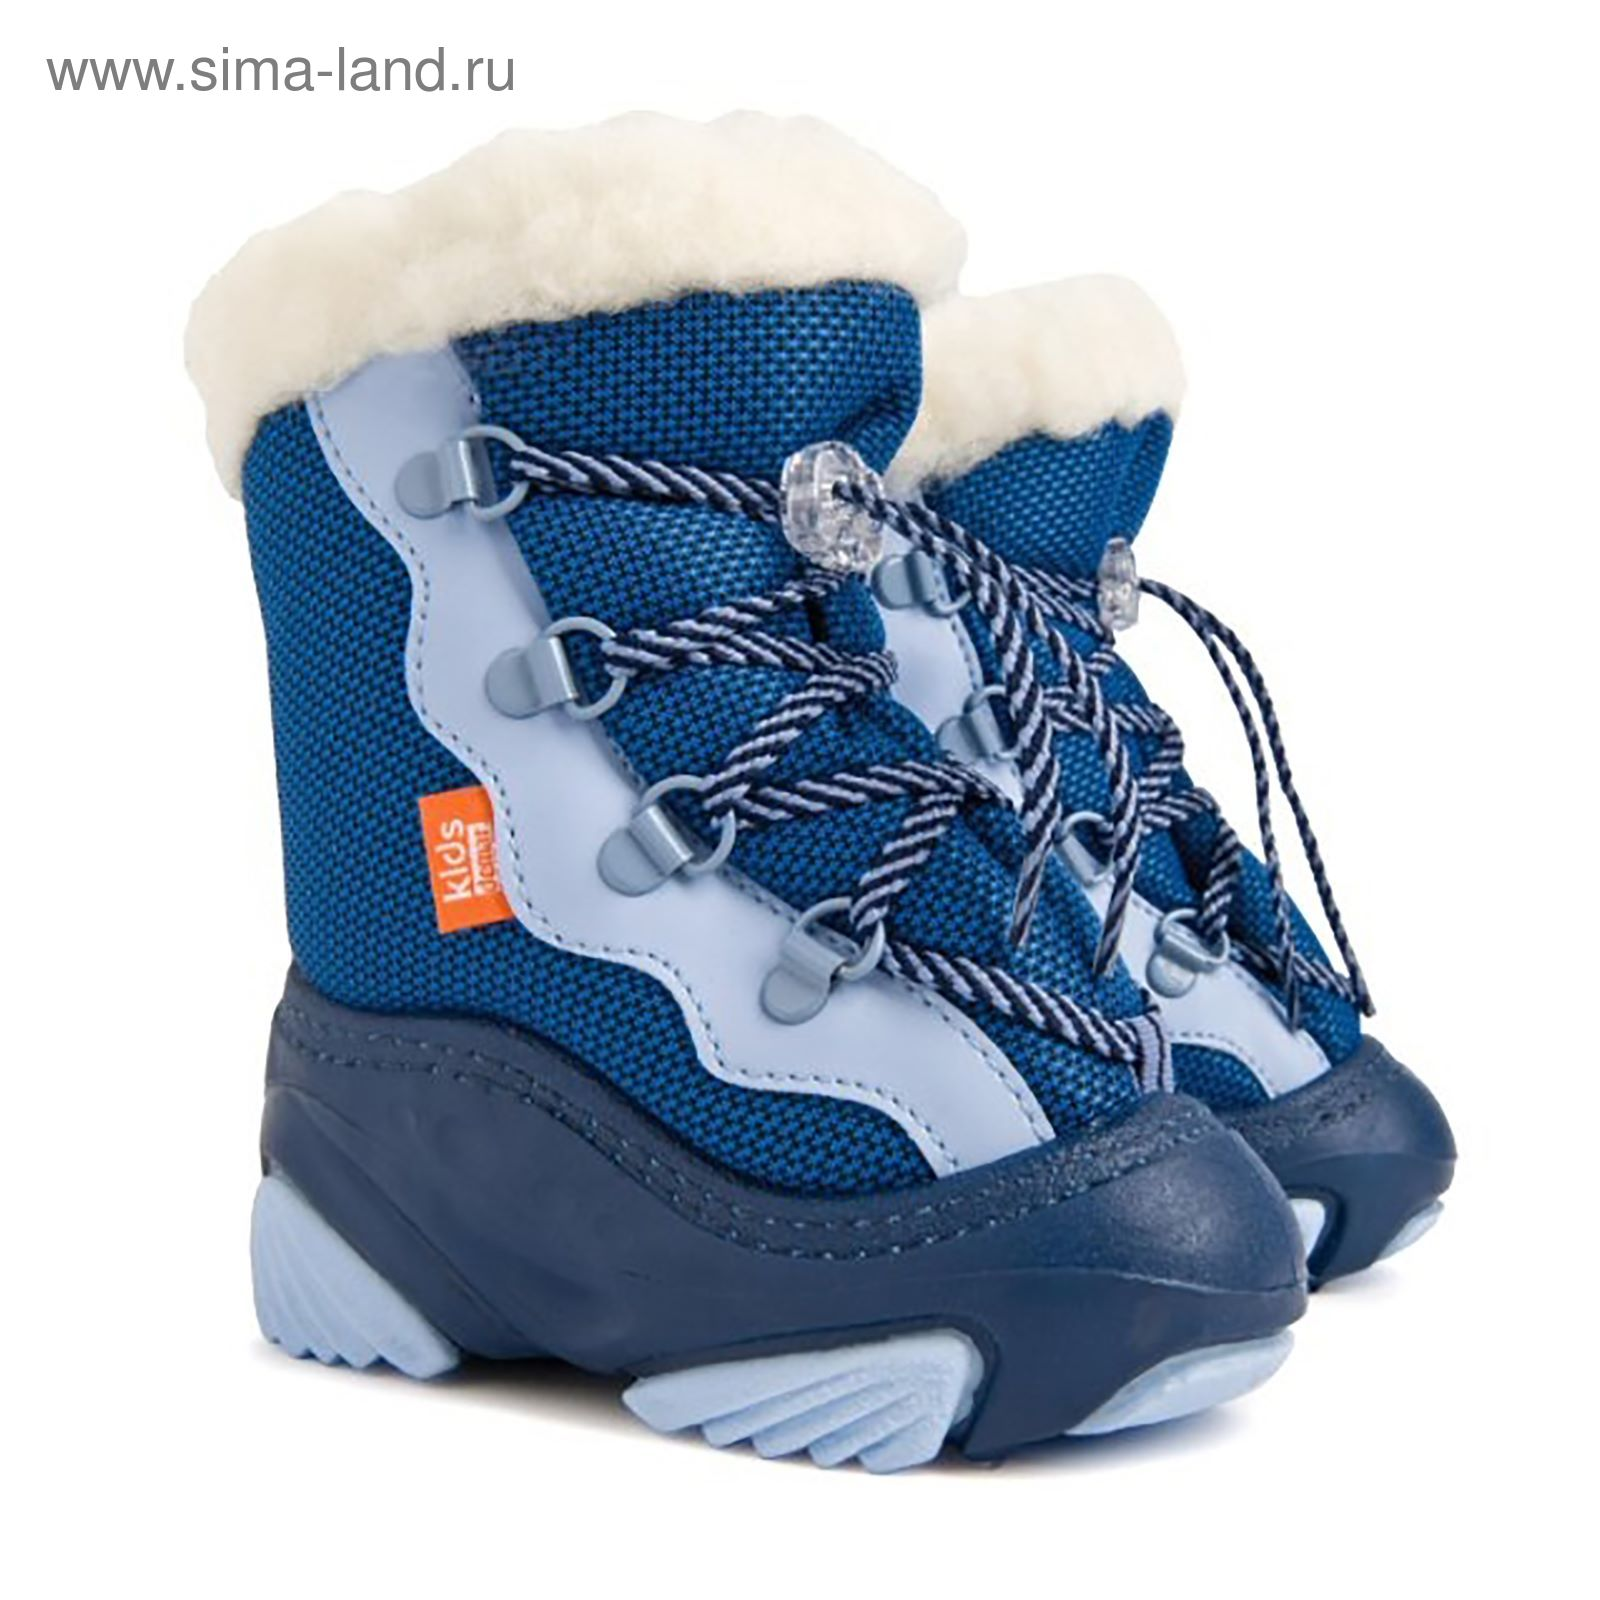 Сапоги Demar Snow Mar d7304df18b1c6